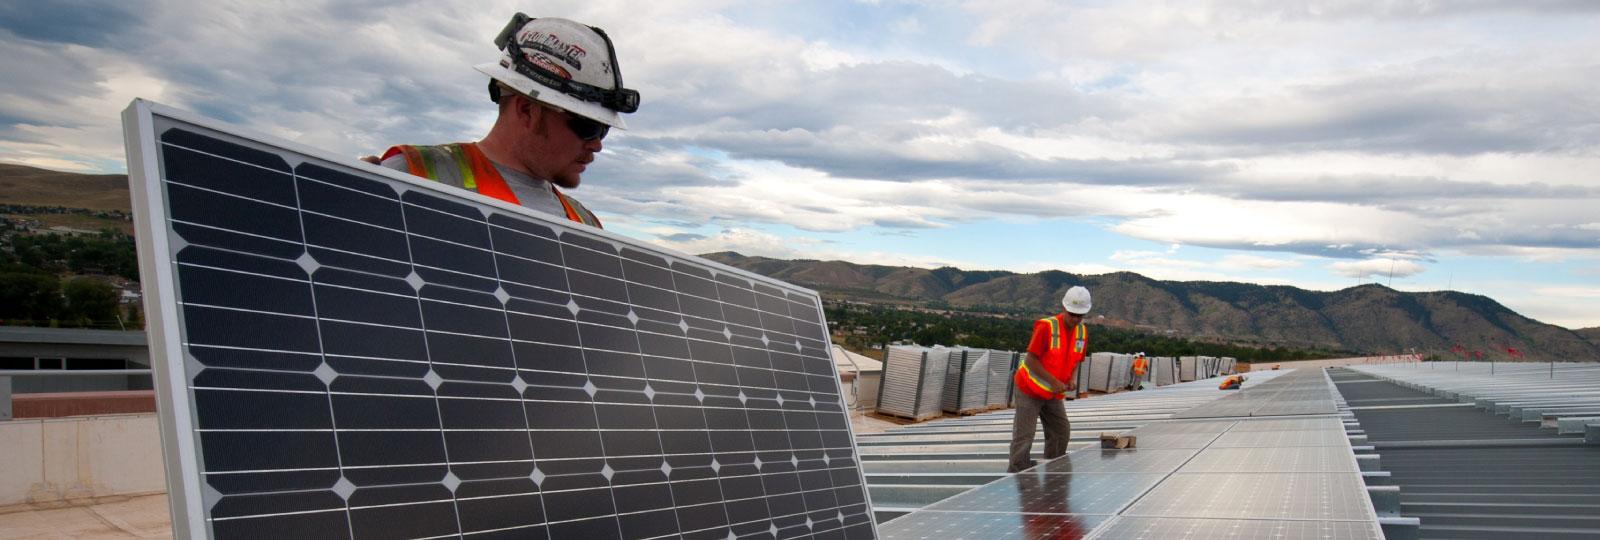 OOS Recycleworks: Renewable Energy & Financing photo